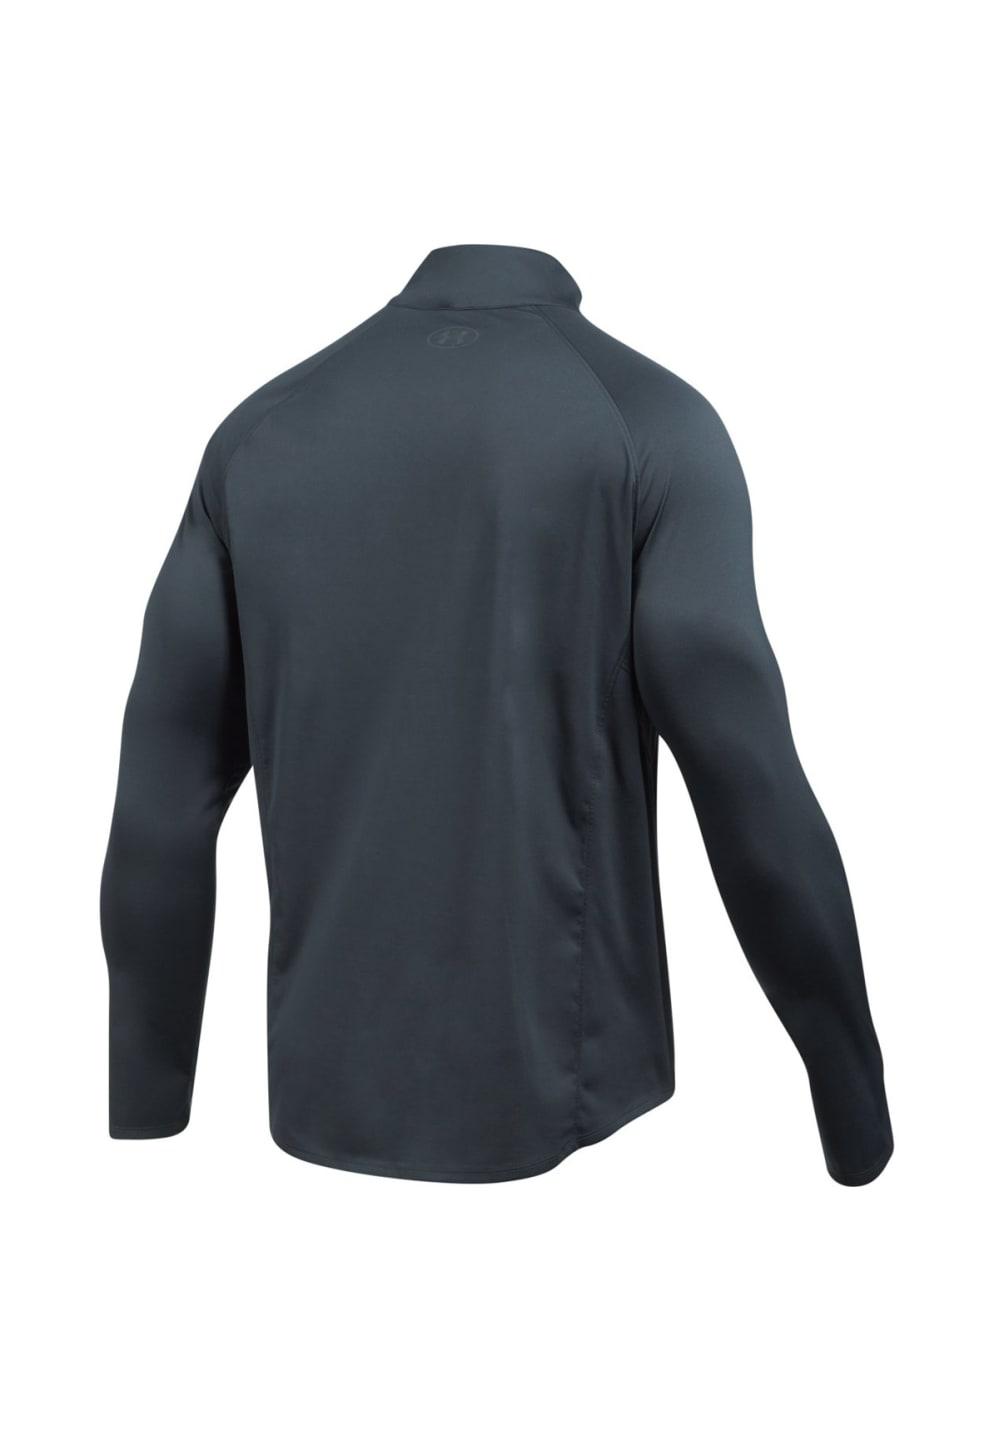 36520108 Under Armour ColdGear Reactor Storm Pace Jacket - Running jackets ...